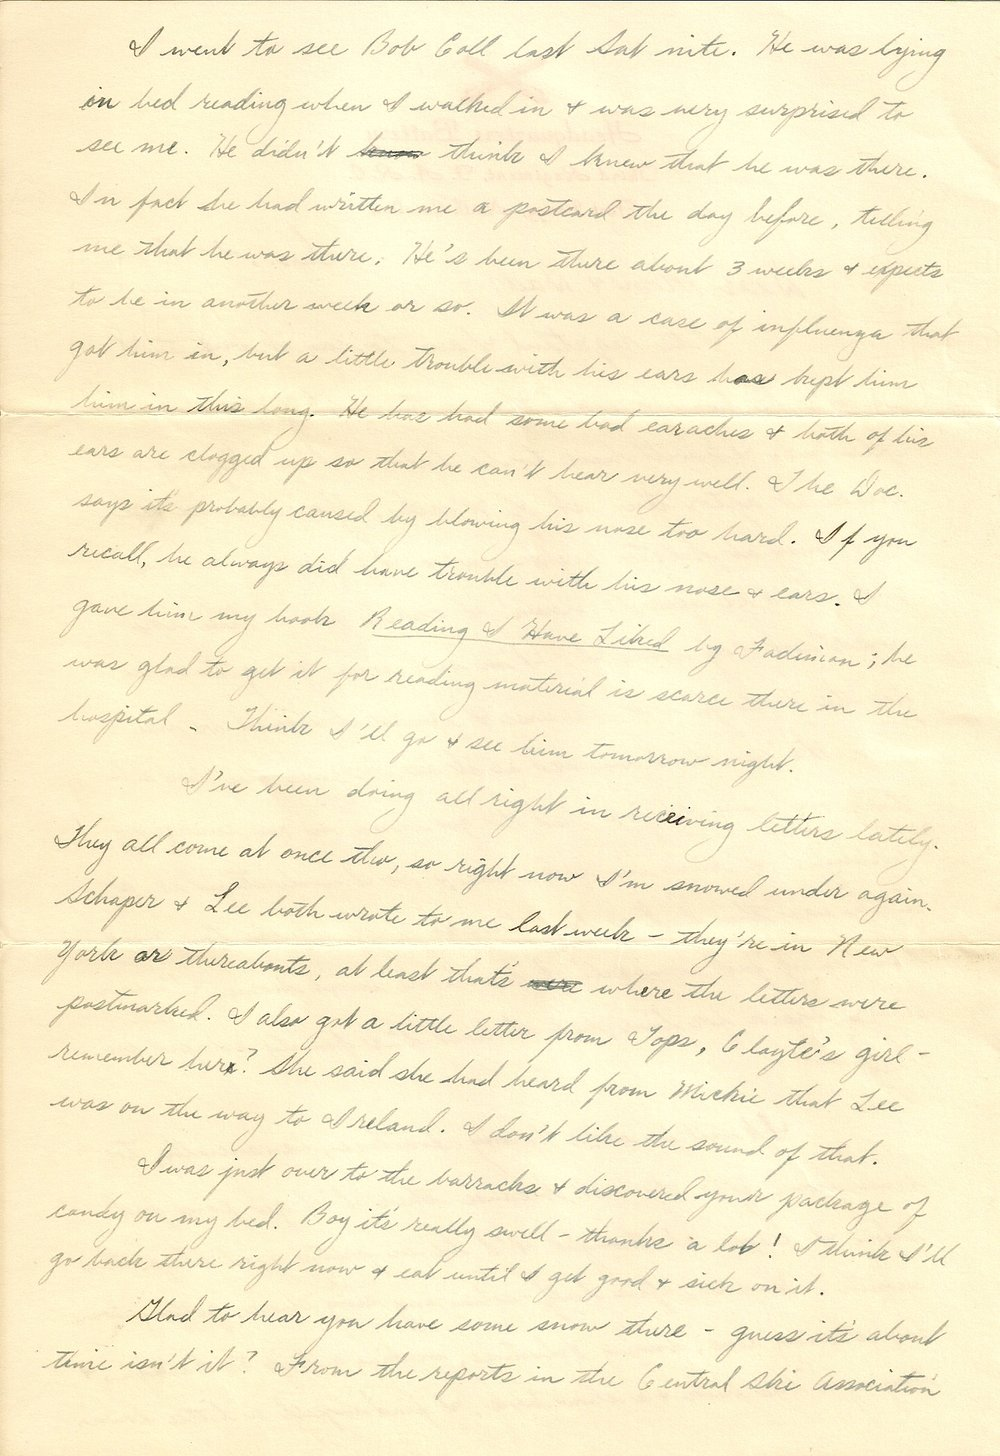 02.15.1942c.jpg